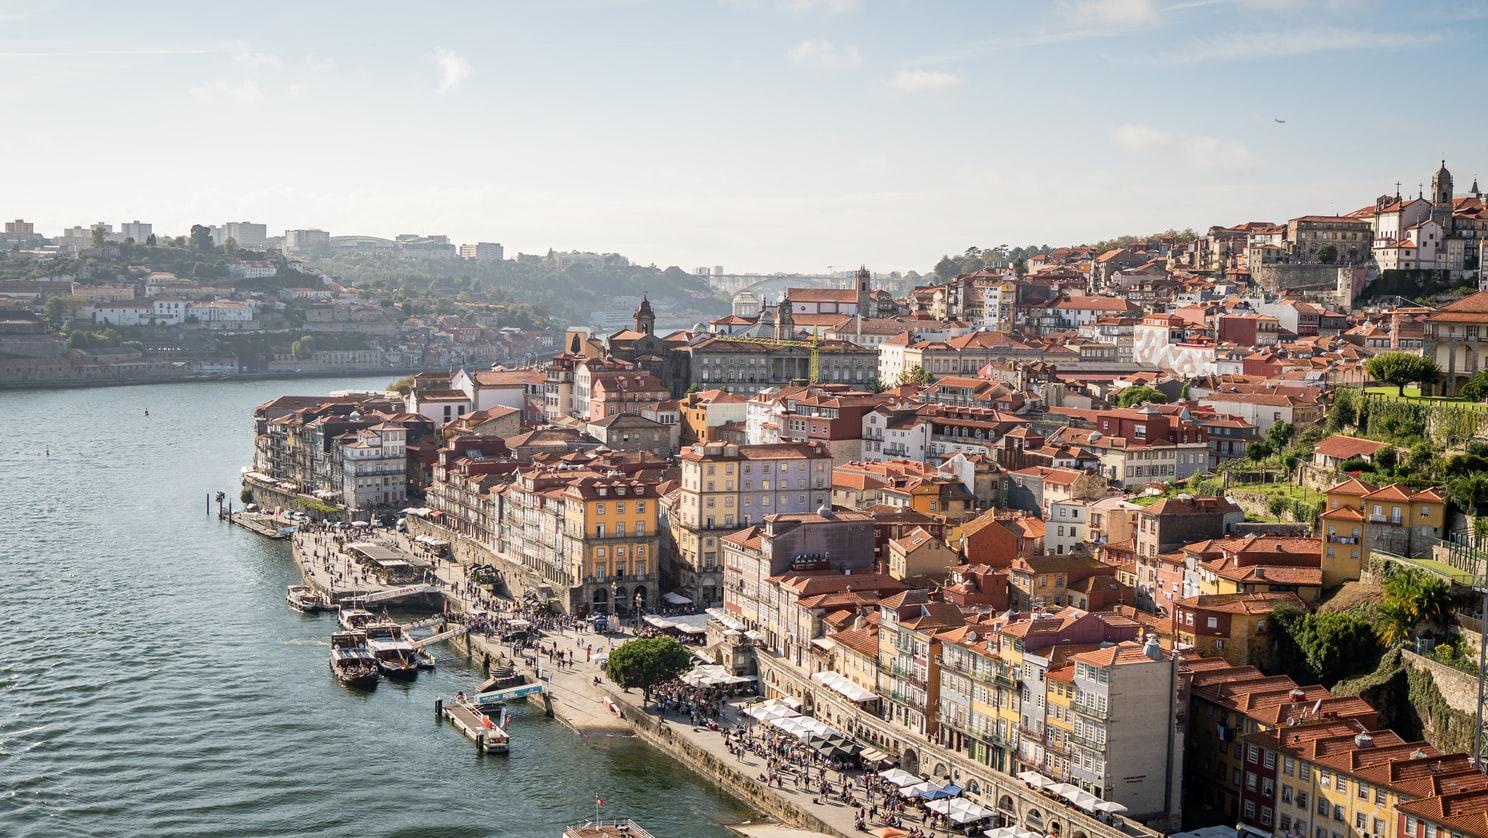 Blick auf Porto am Ufer des Douro